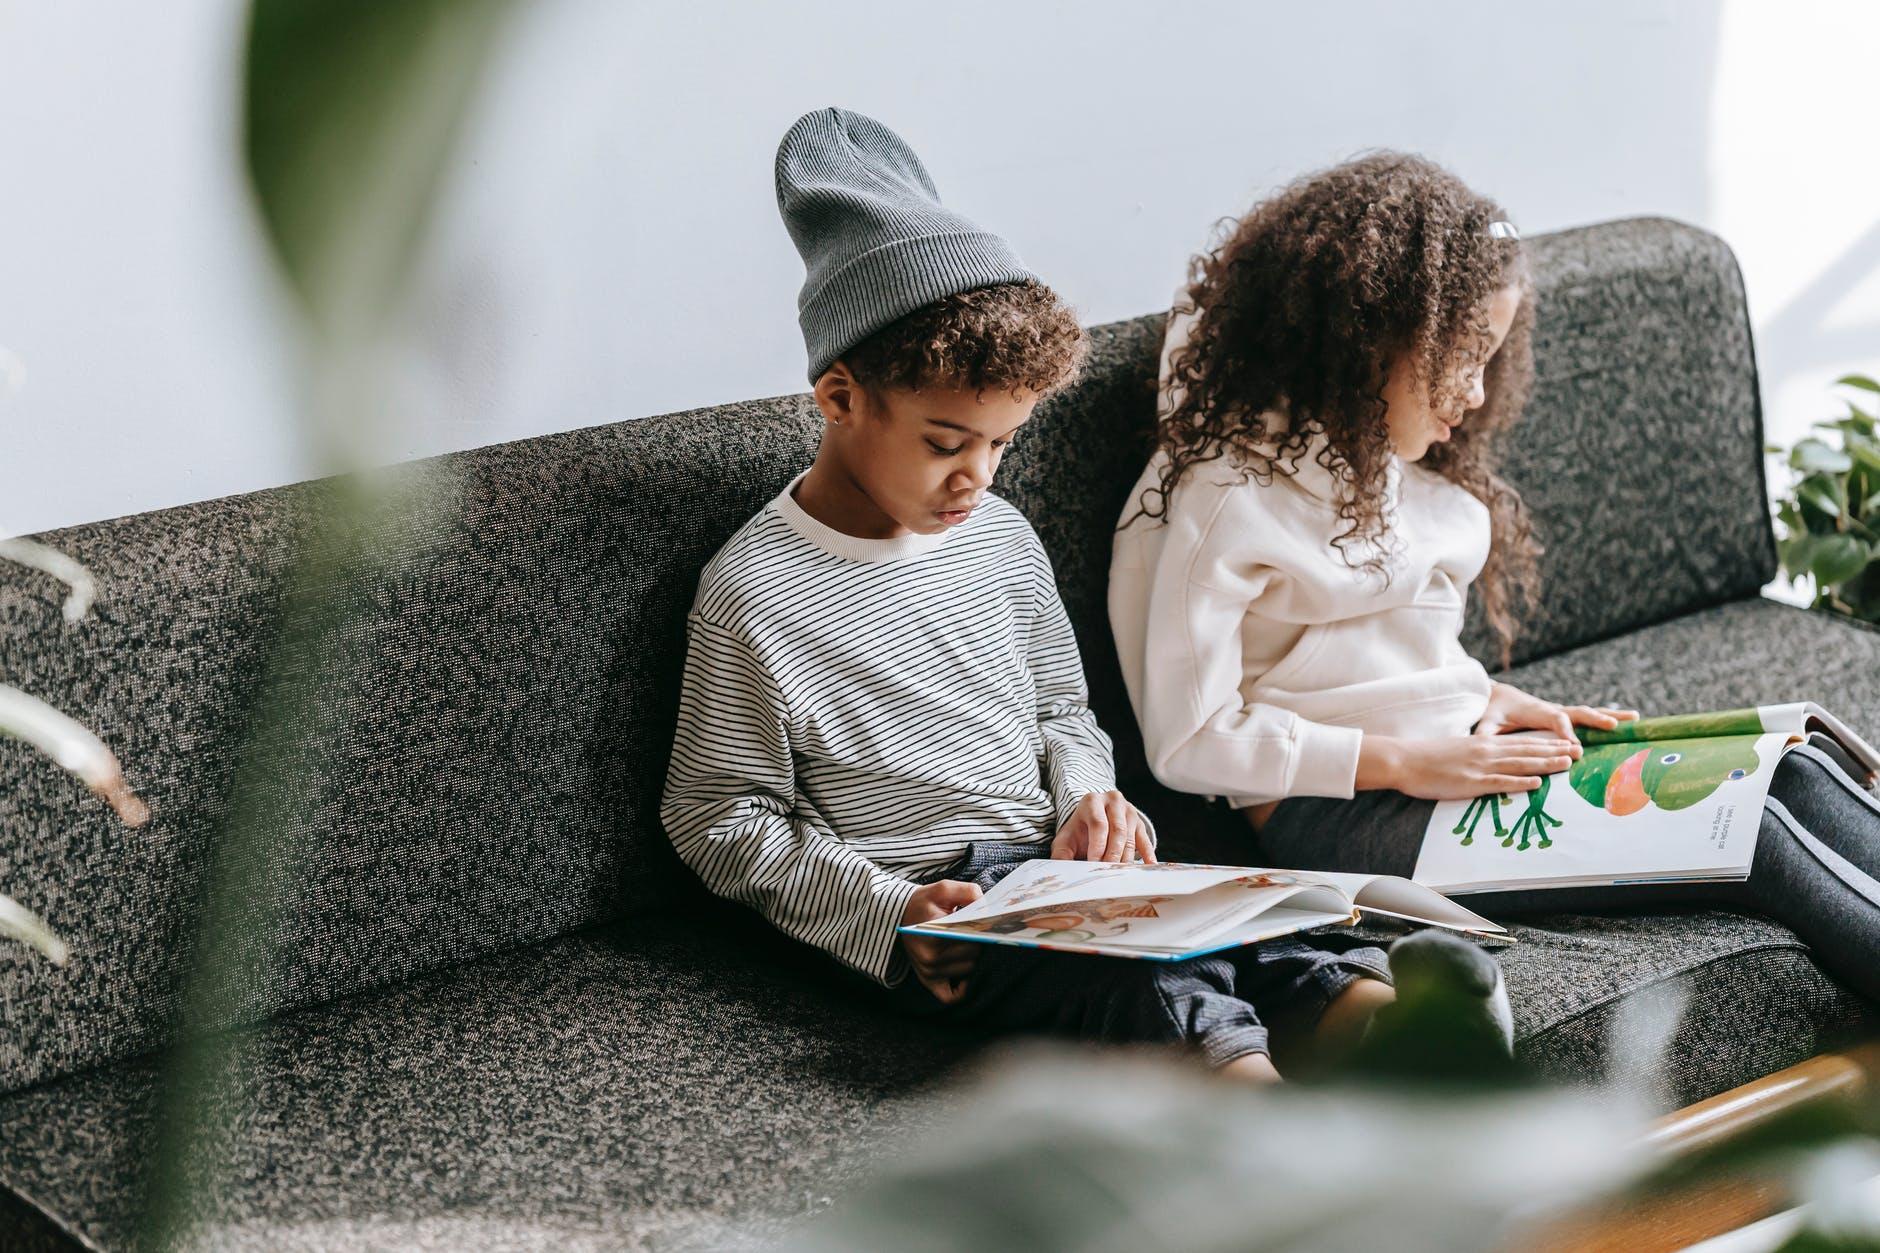 focused black children reading books with bright illustrations